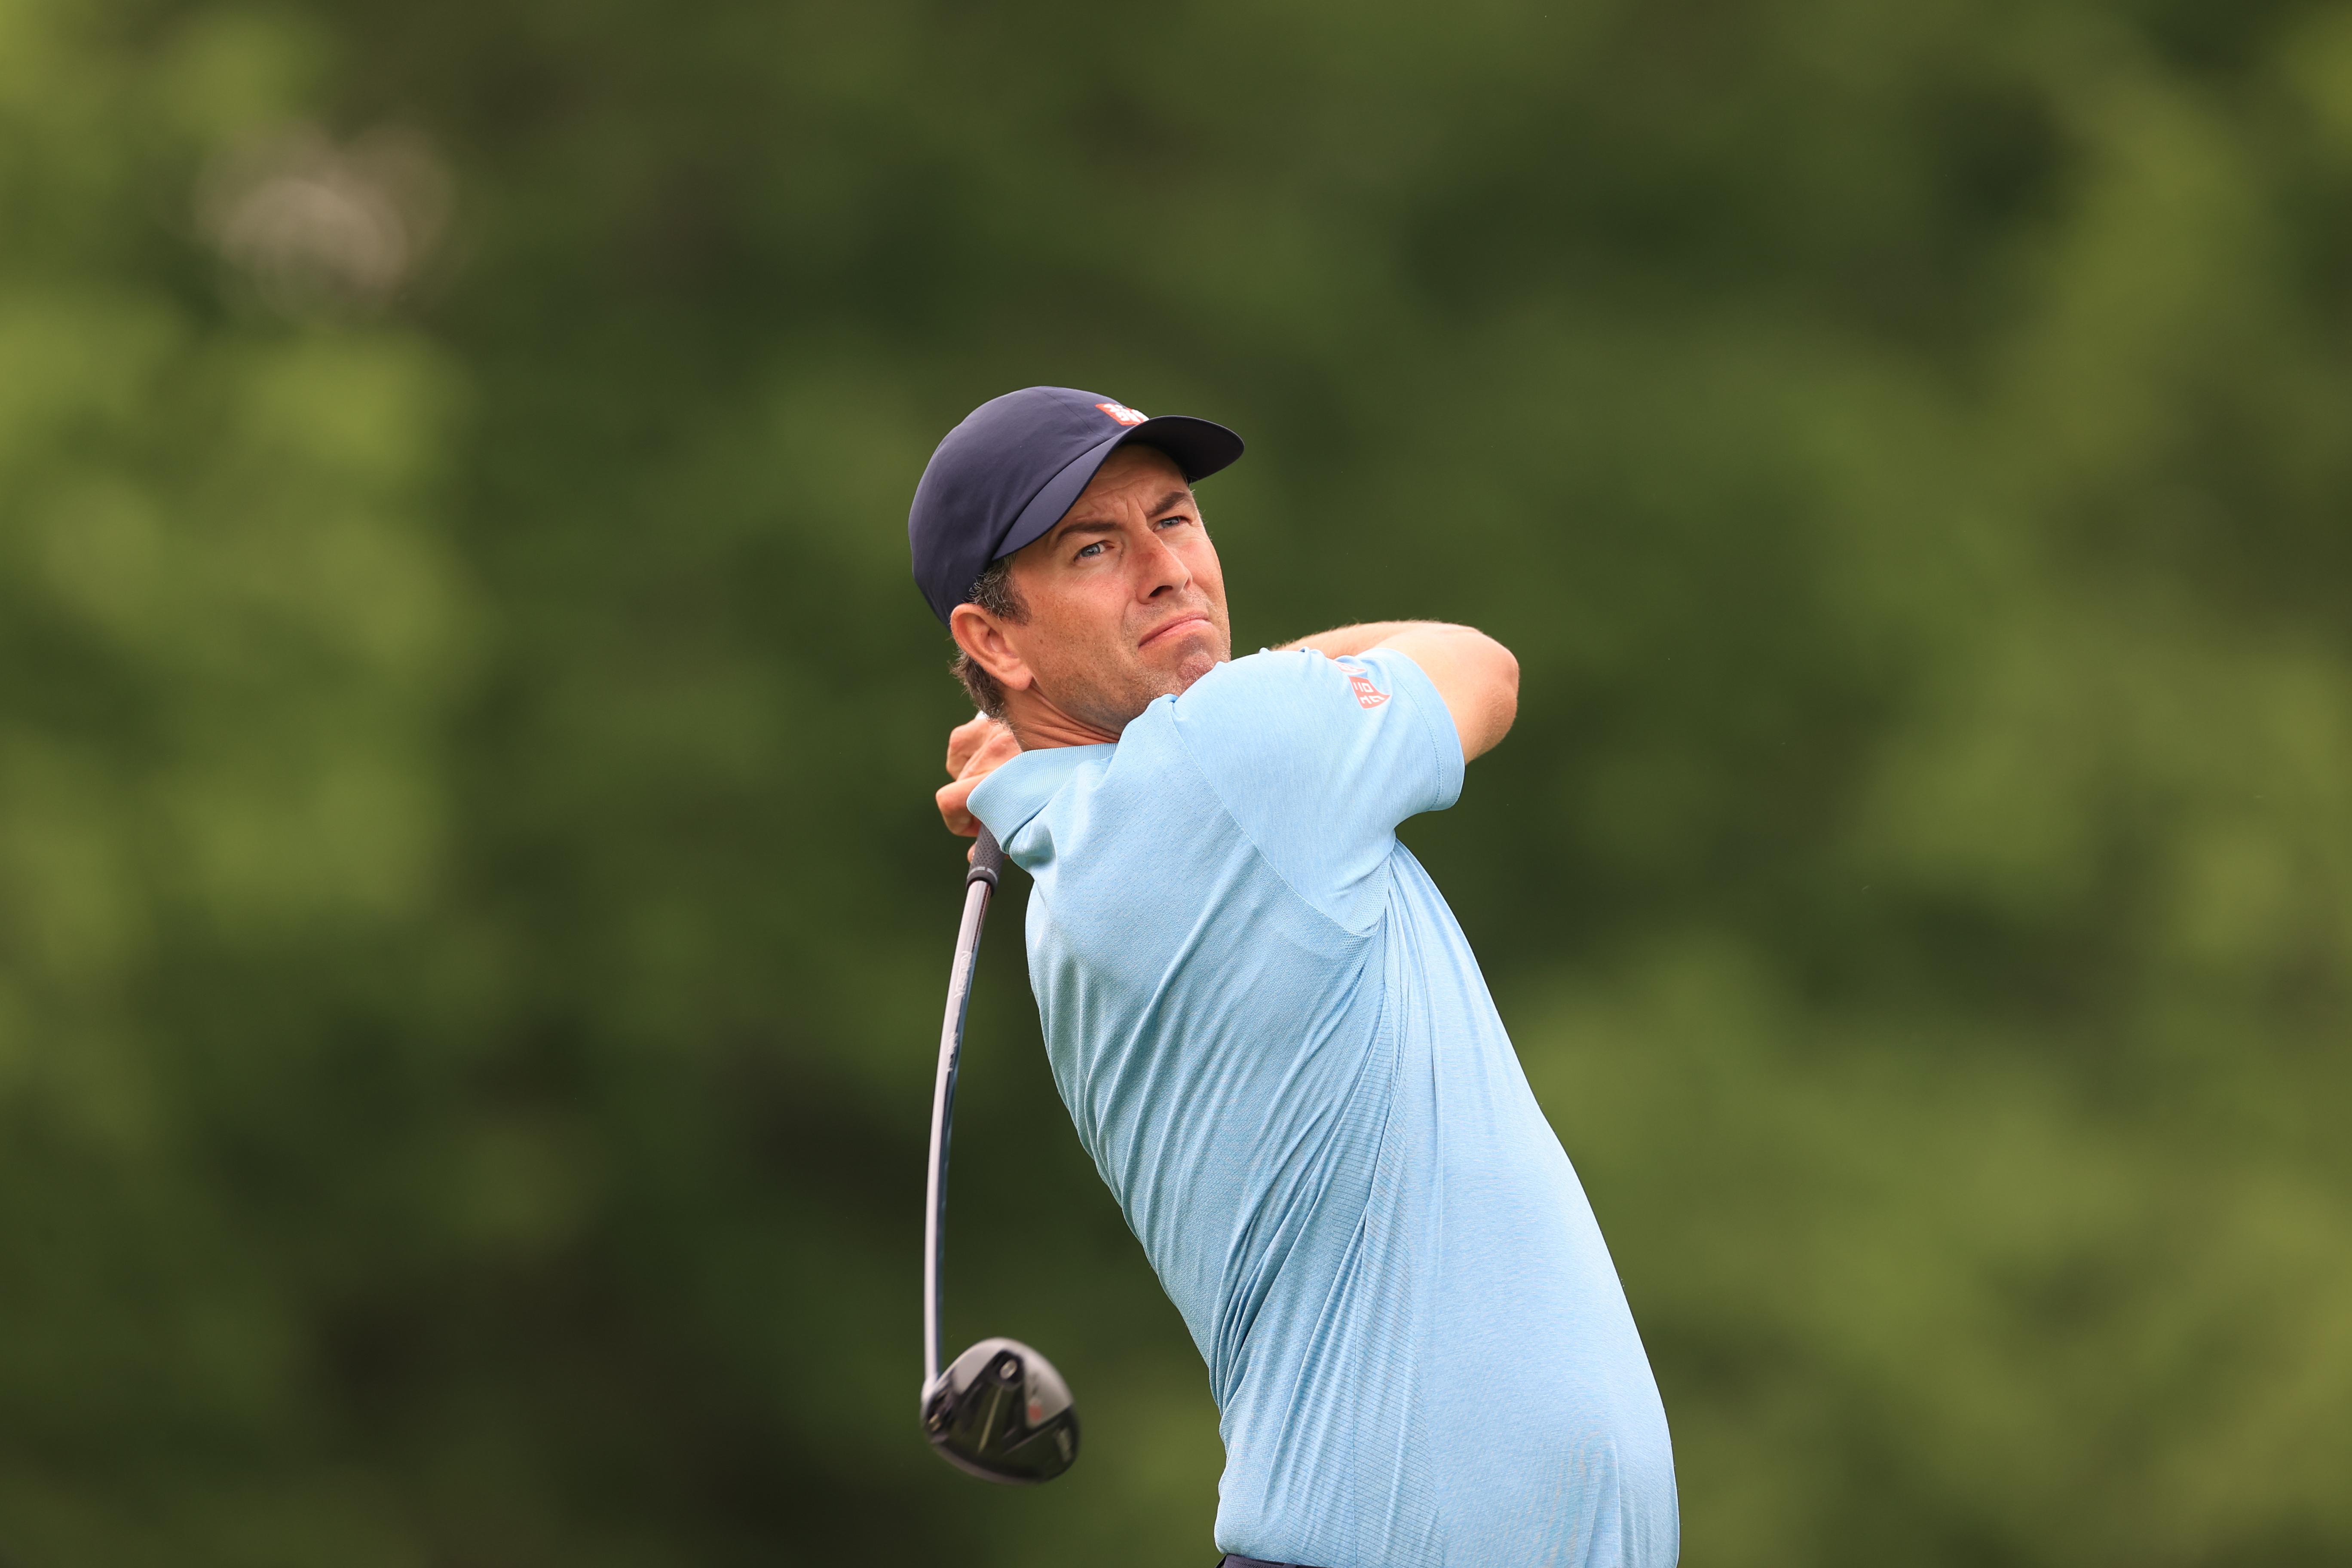 3 Helpful Golfing Tips For Beginners